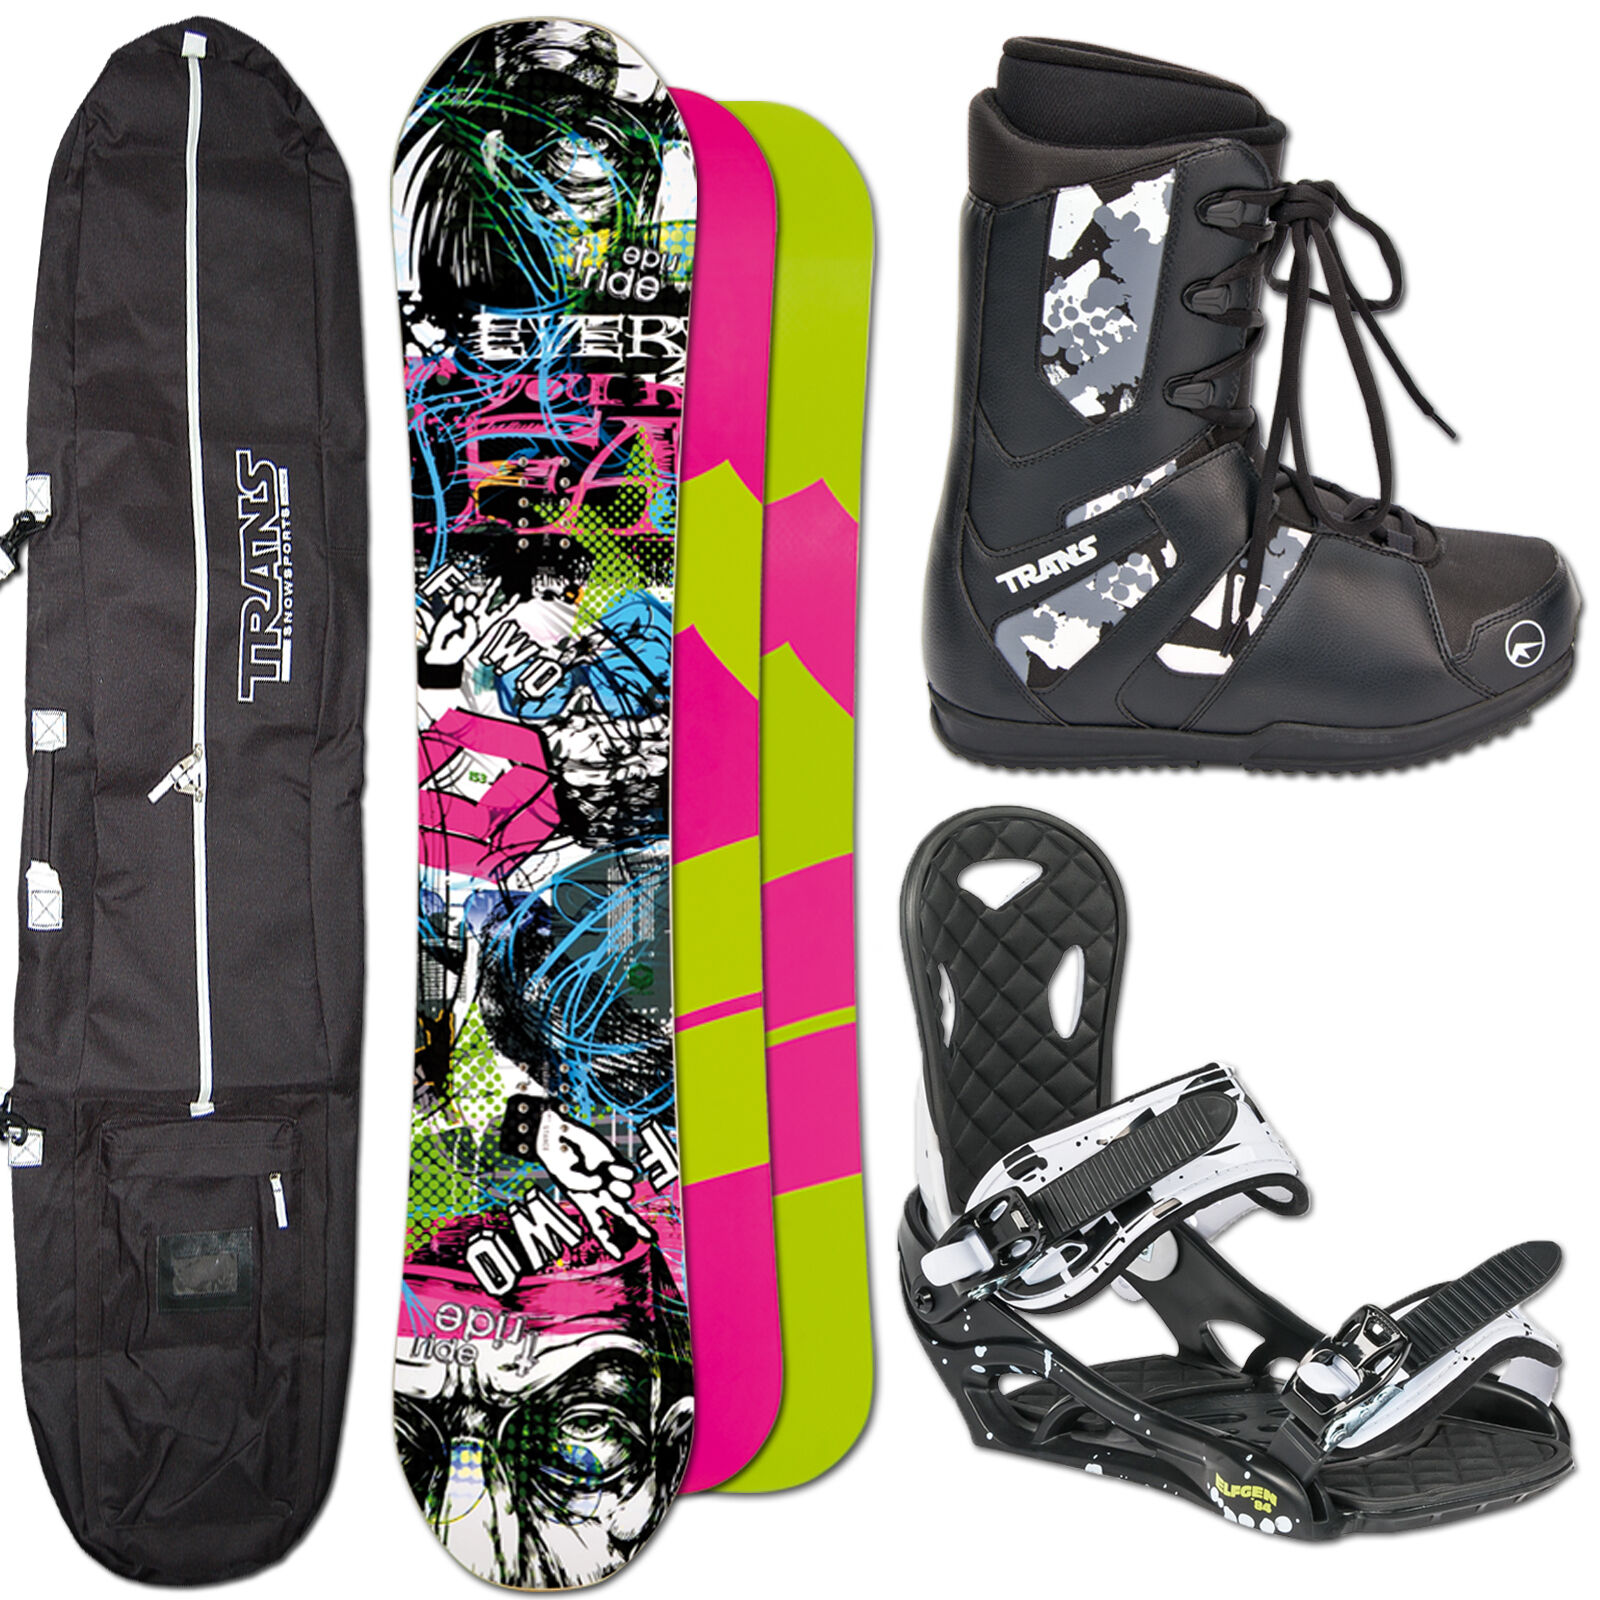 SNOWBOARD SET FTWO T-RIDE 148 CM + ELFGEN ECO BINDUNG M + BAG + BOOTS